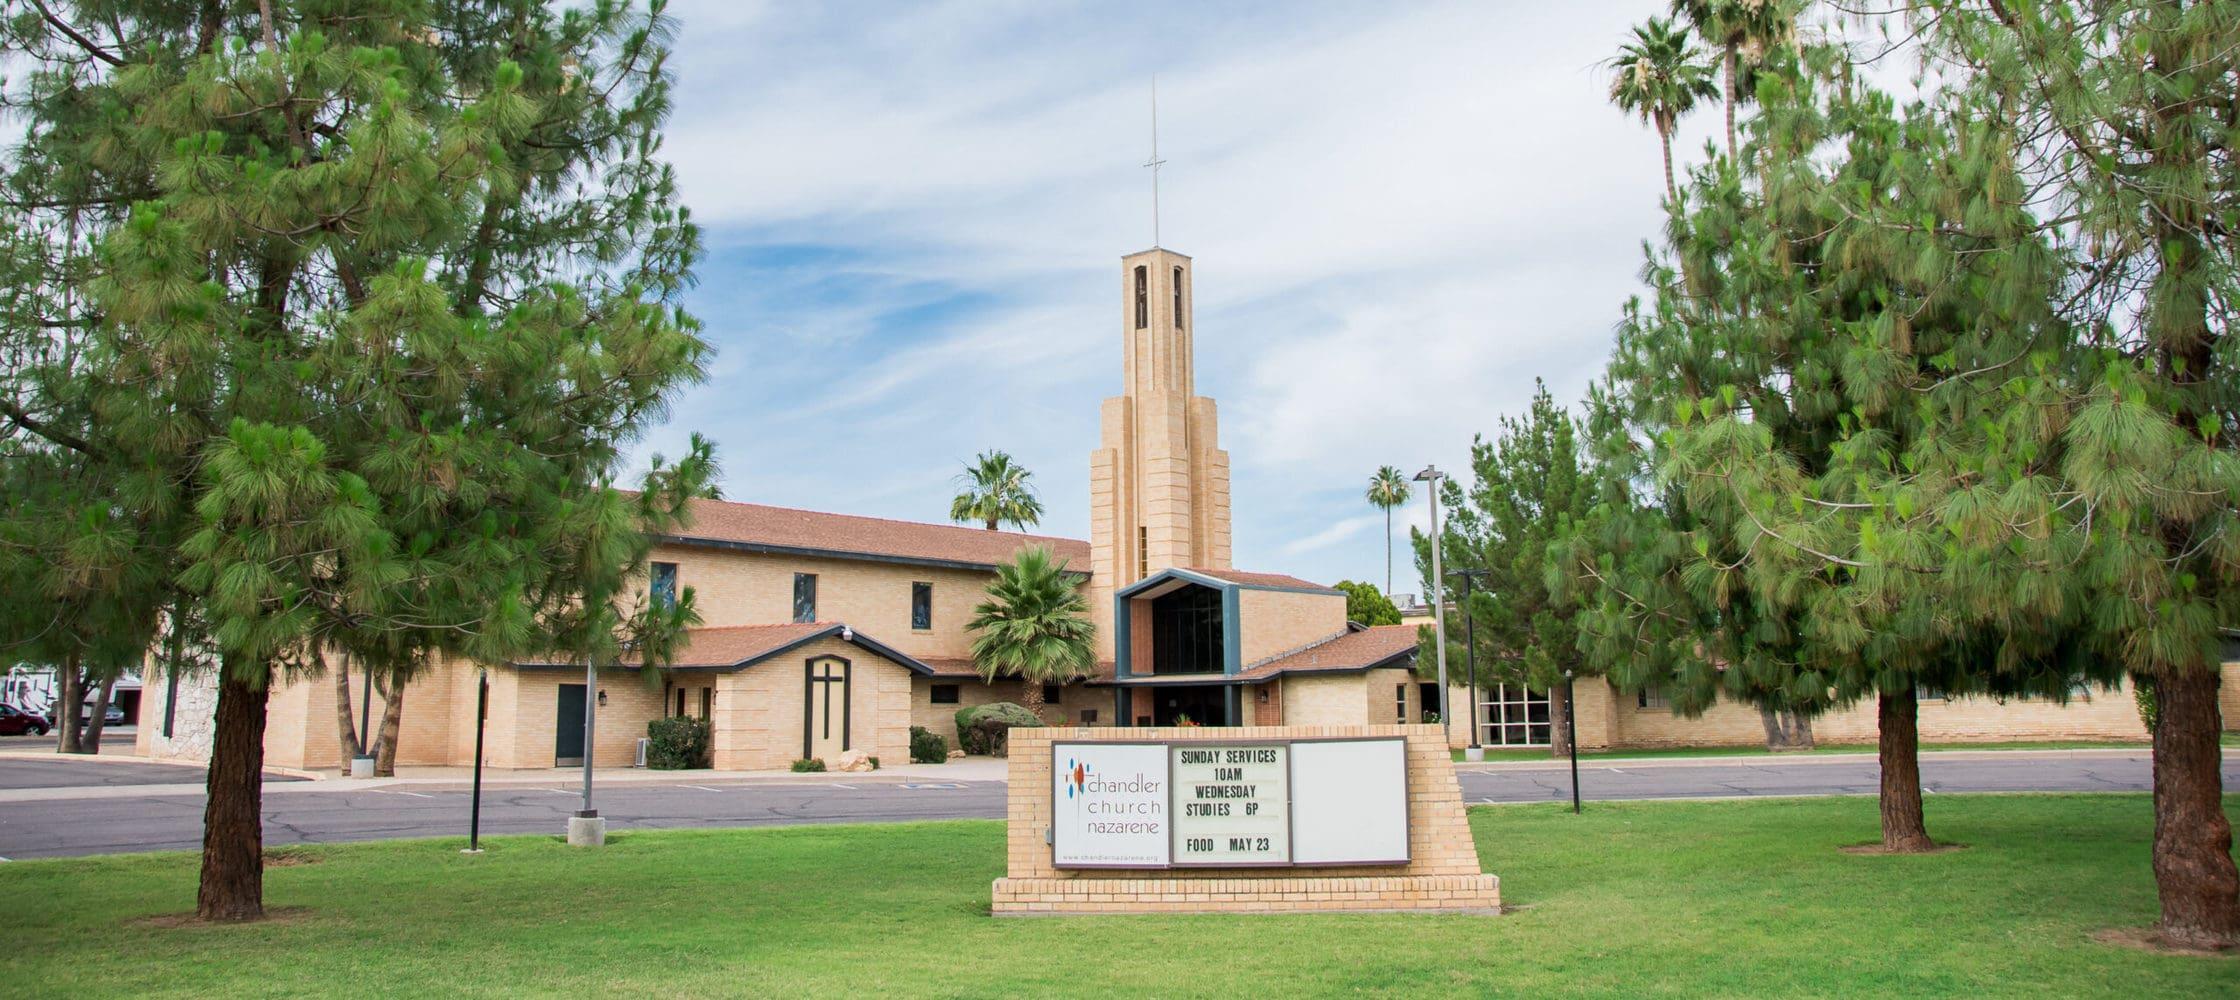 Christian Church in Chandler, Arizona